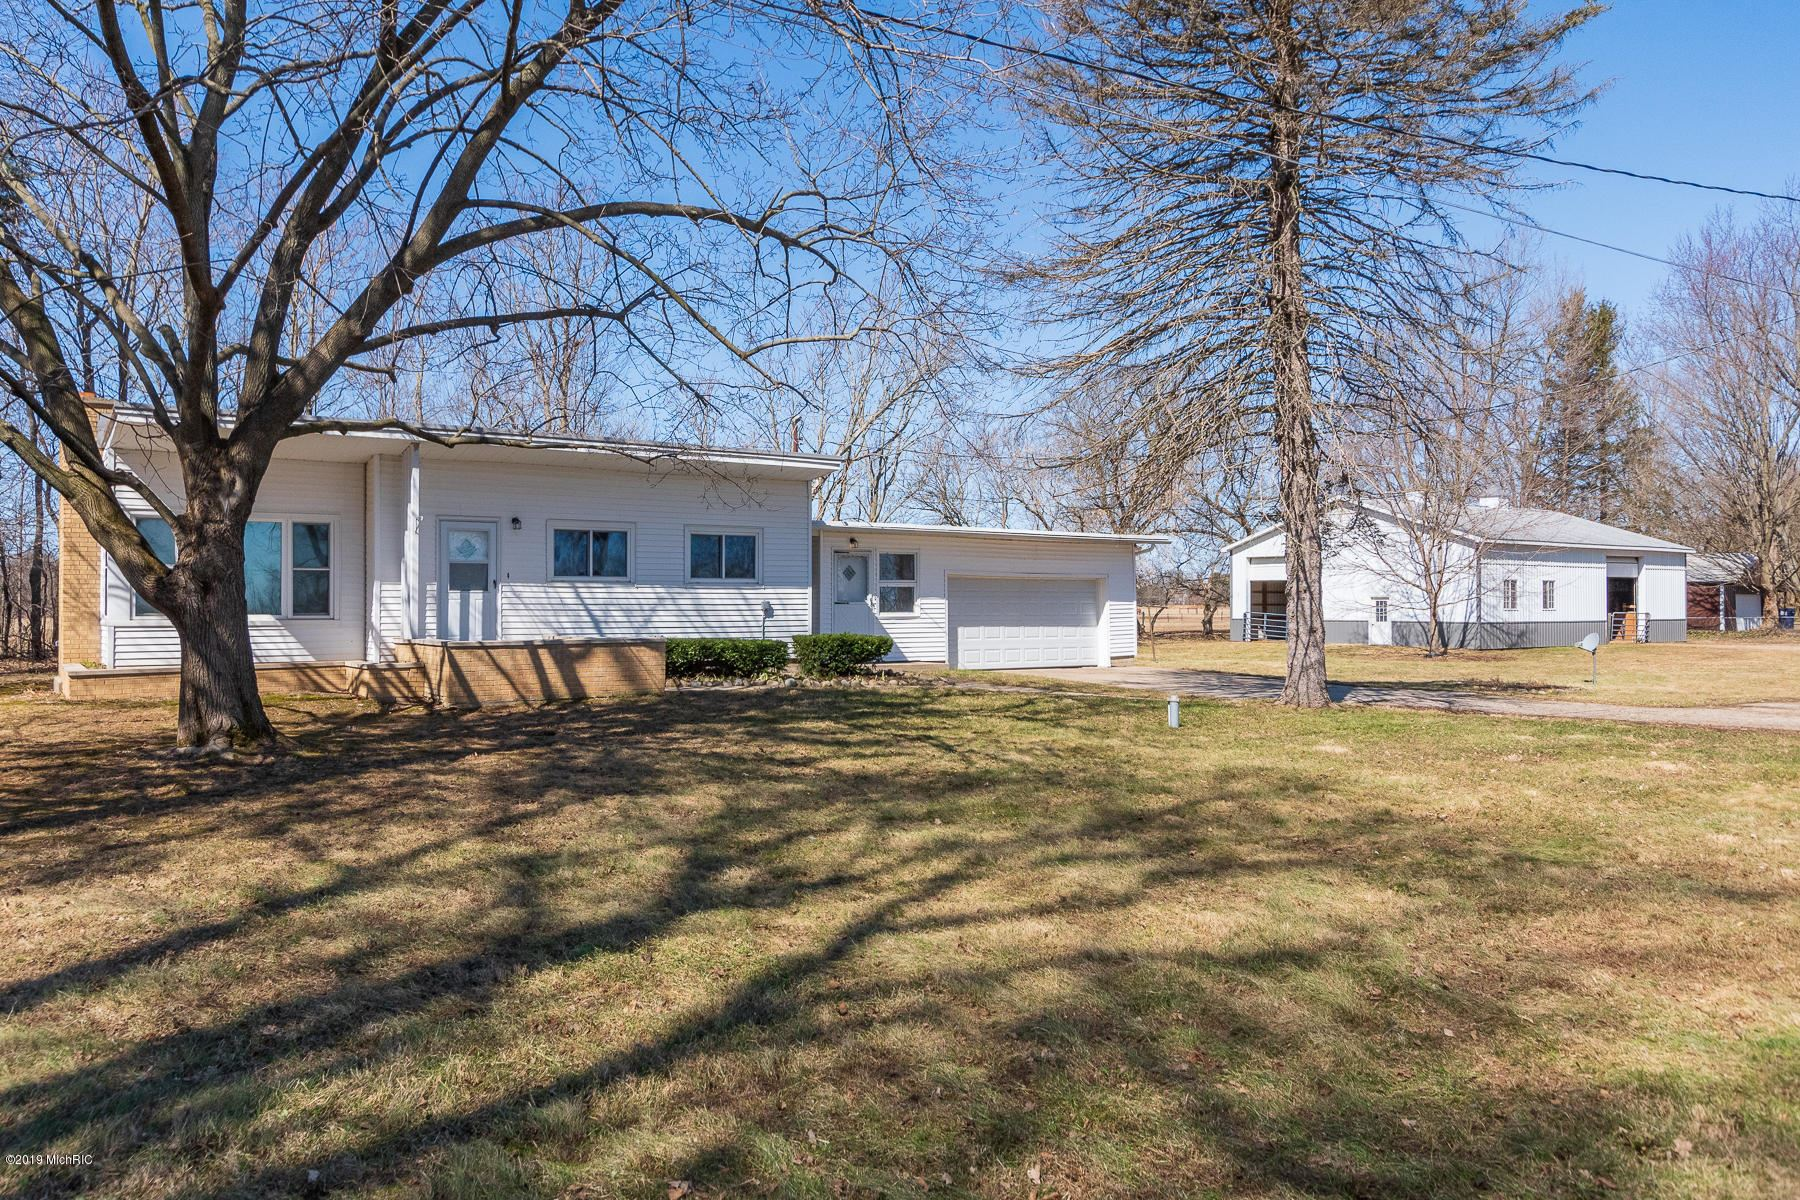 15892 Kellogg School Road, Hickory Corners, MI 49060 - MLS#: 21022405